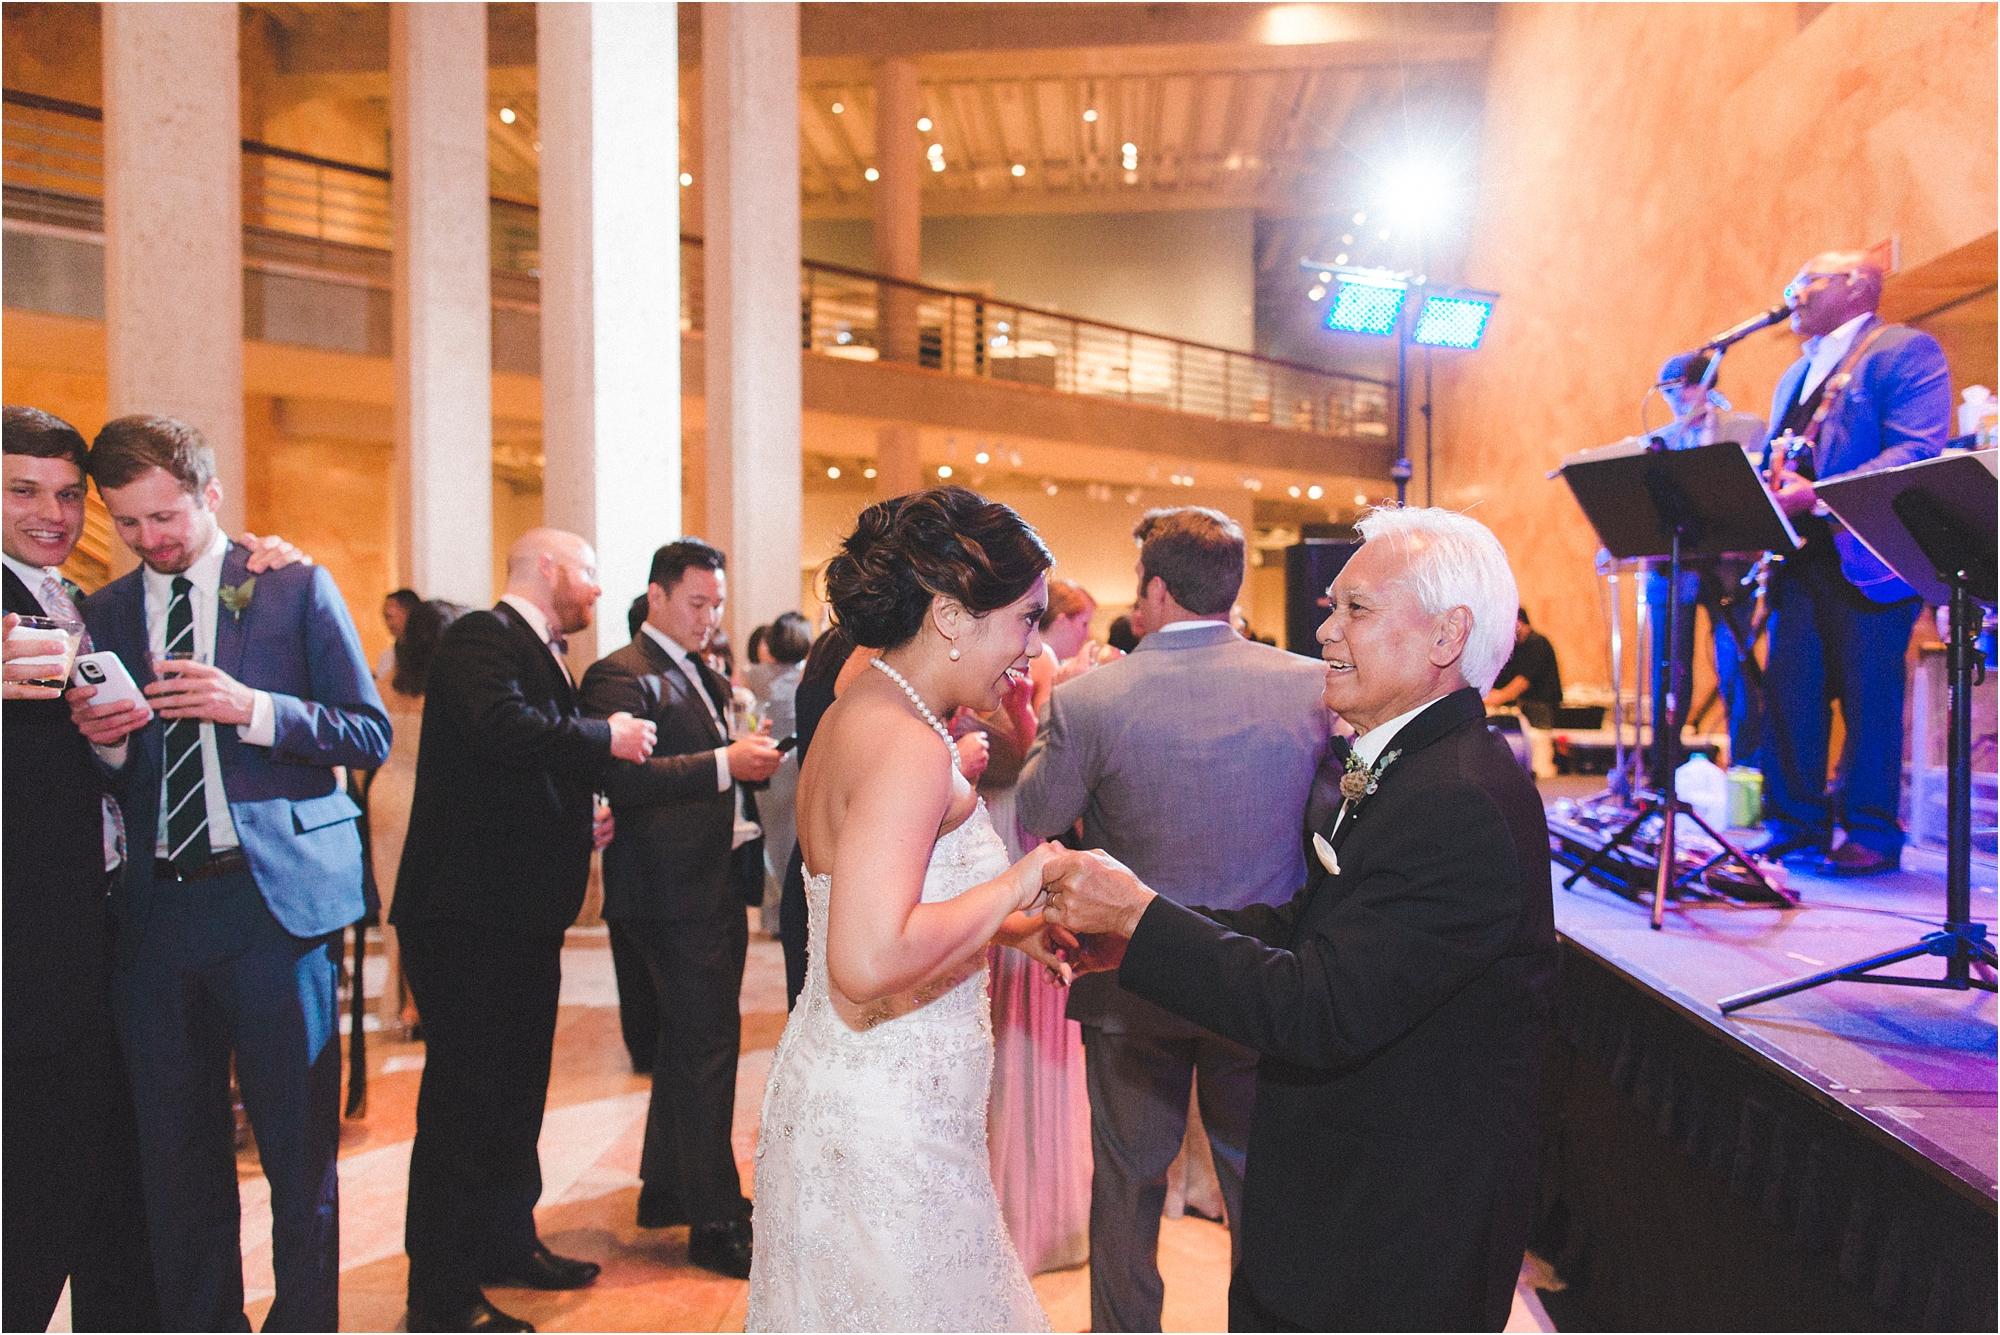 stephanie-yonce-photography-historic-church-virginia-museu-fine-arts-wedding-photos_081.JPG